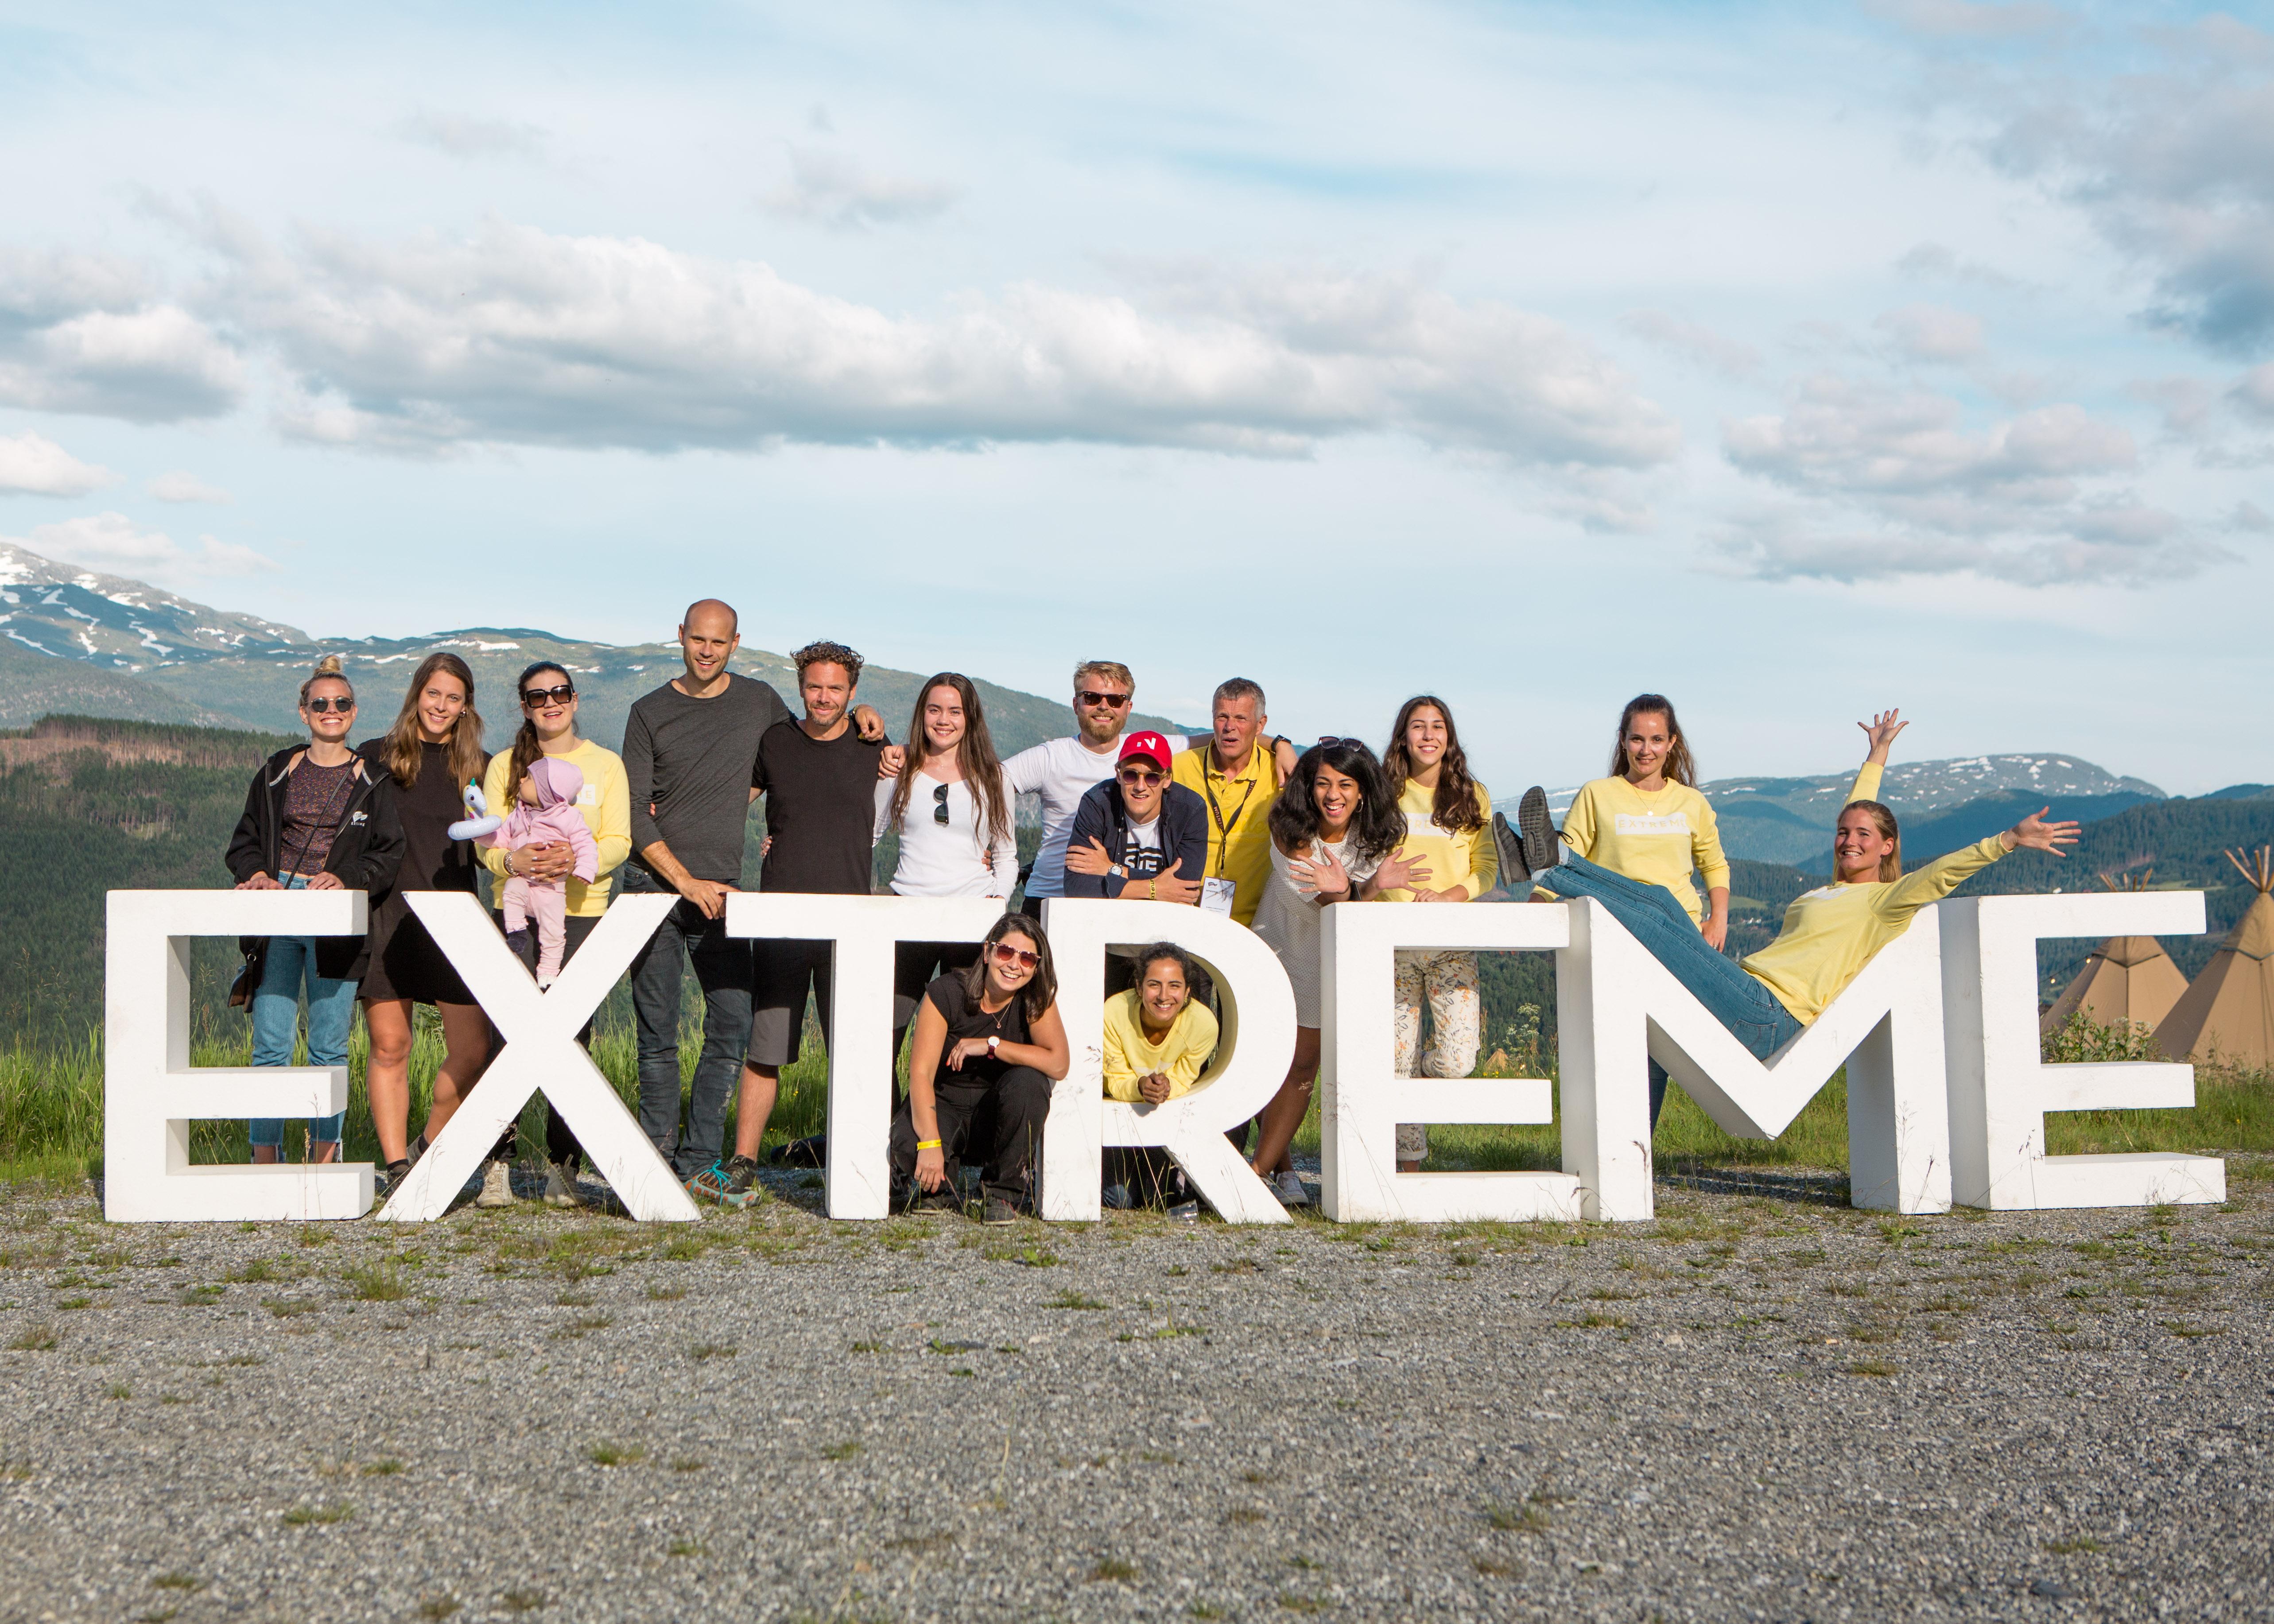 Team Extreme 2018. Foto: Fredrik Steen